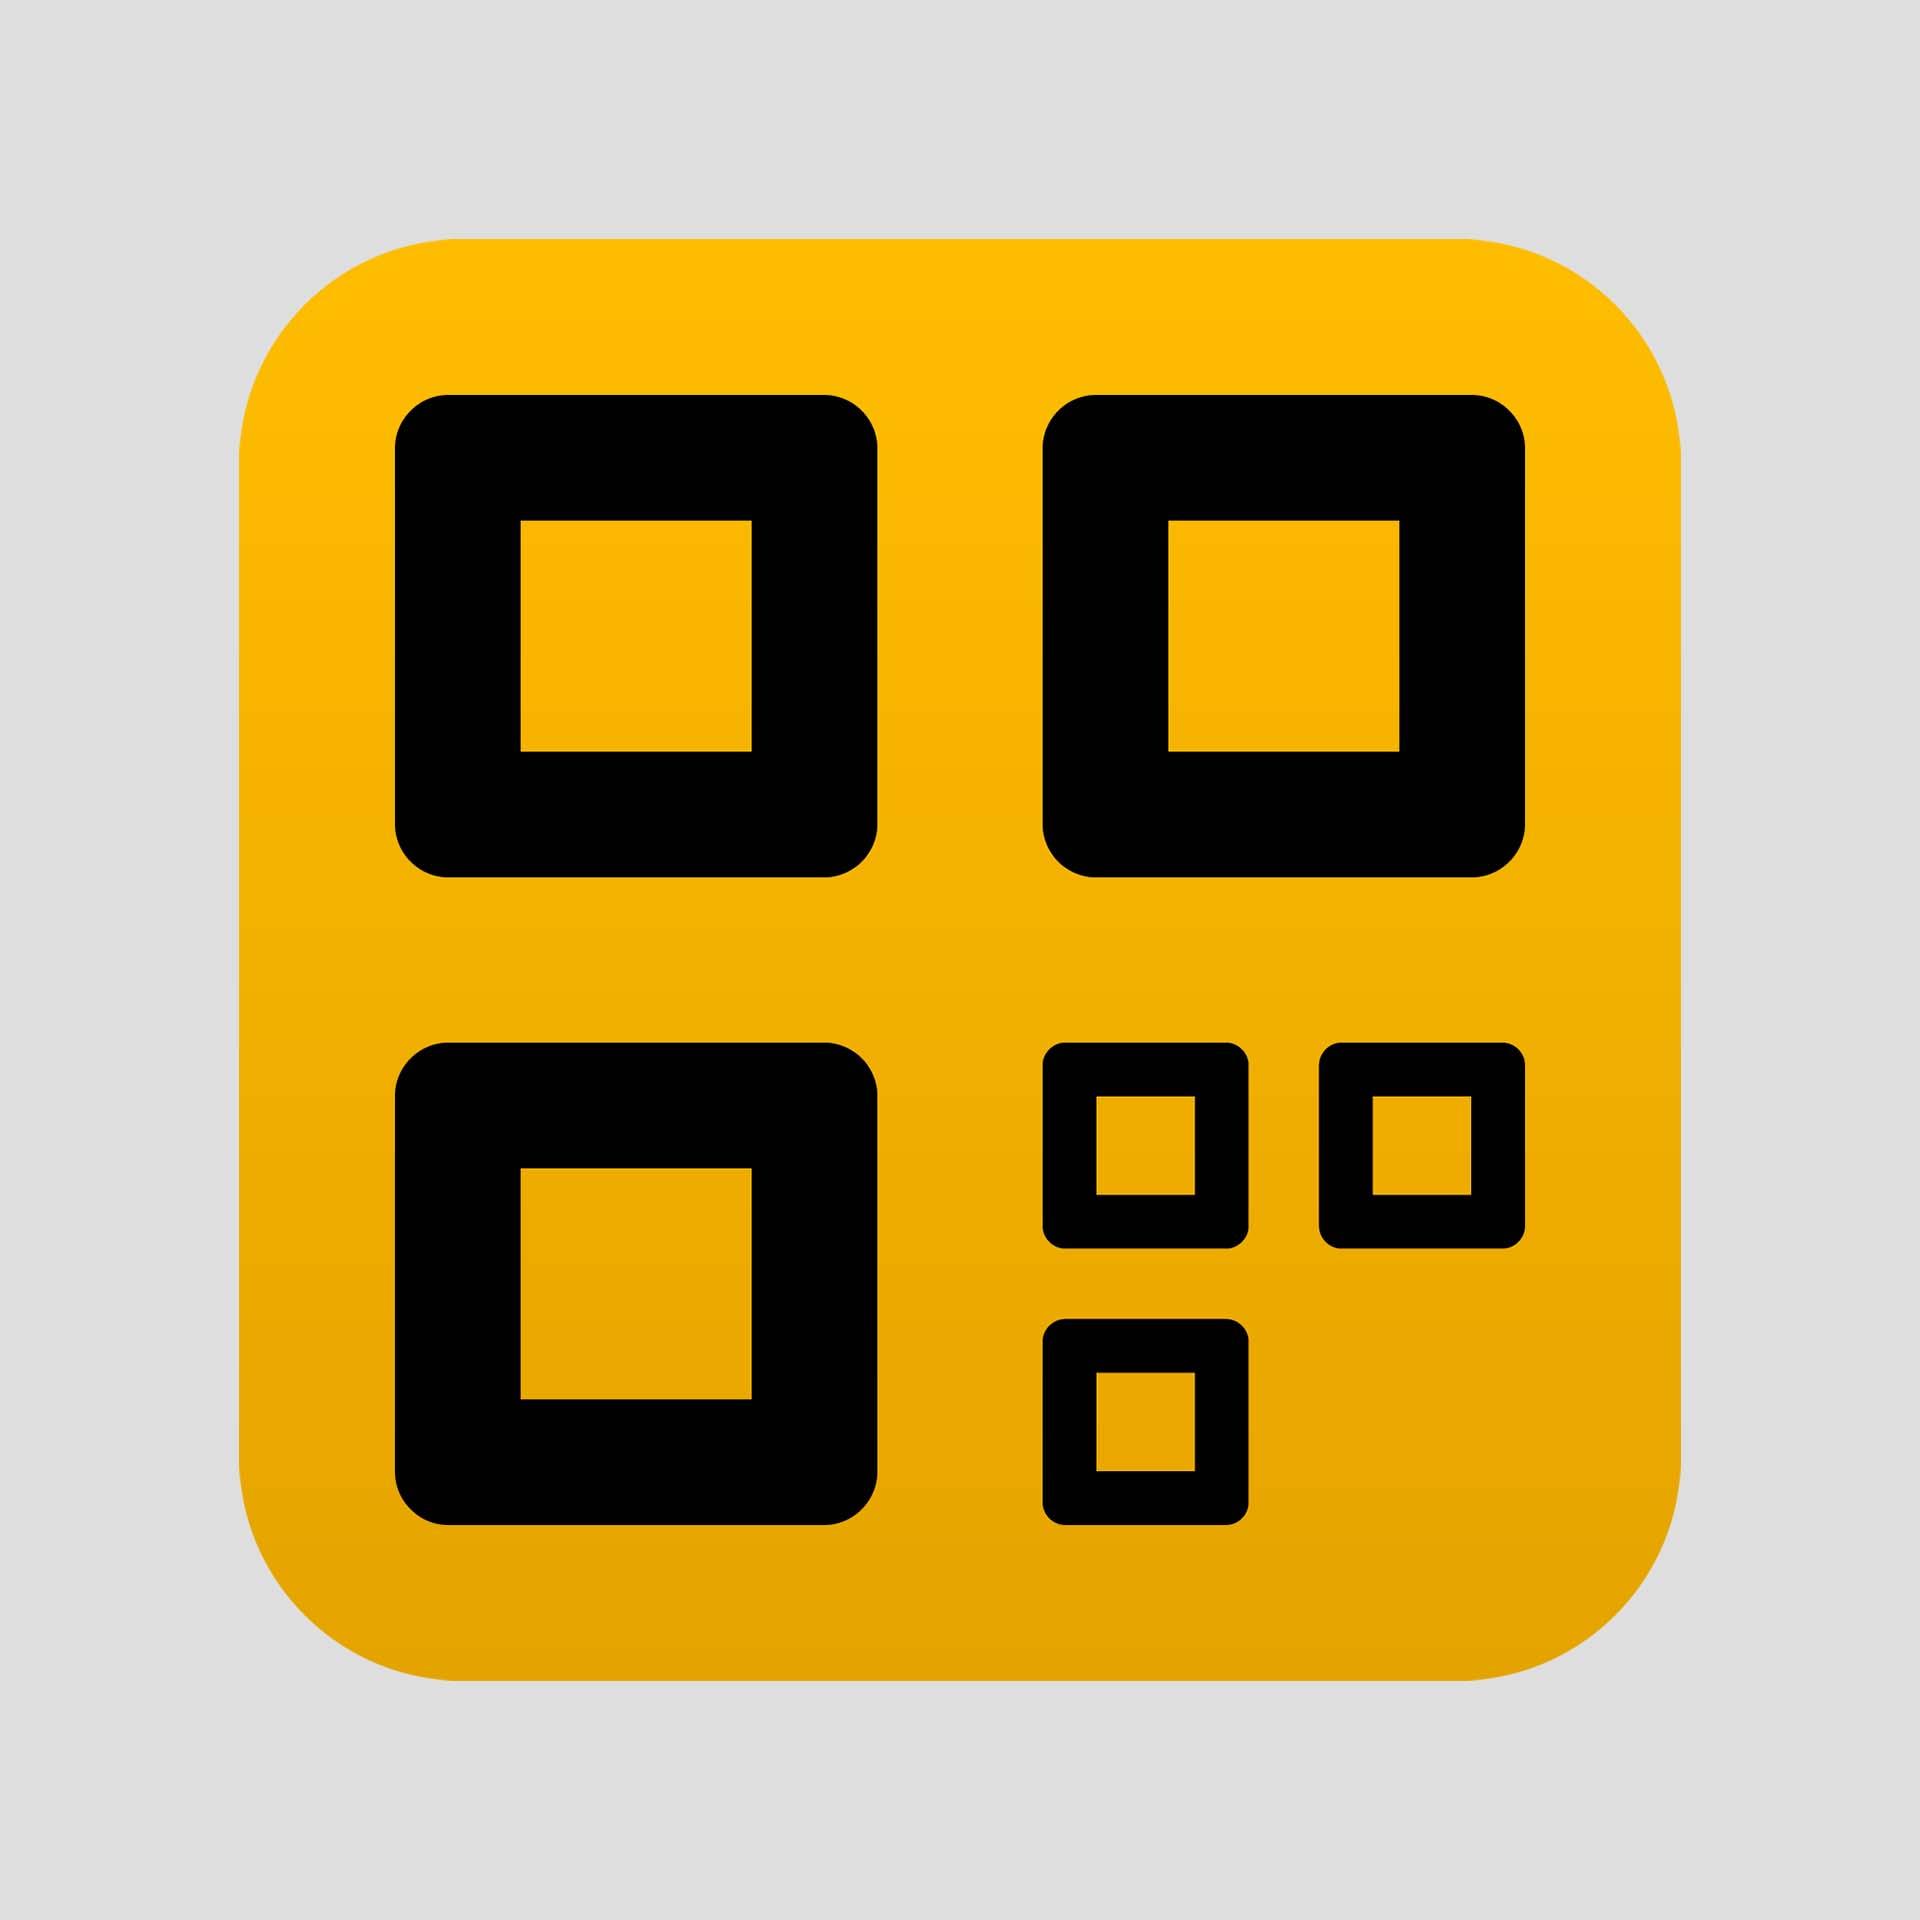 Easily Display QR Codes